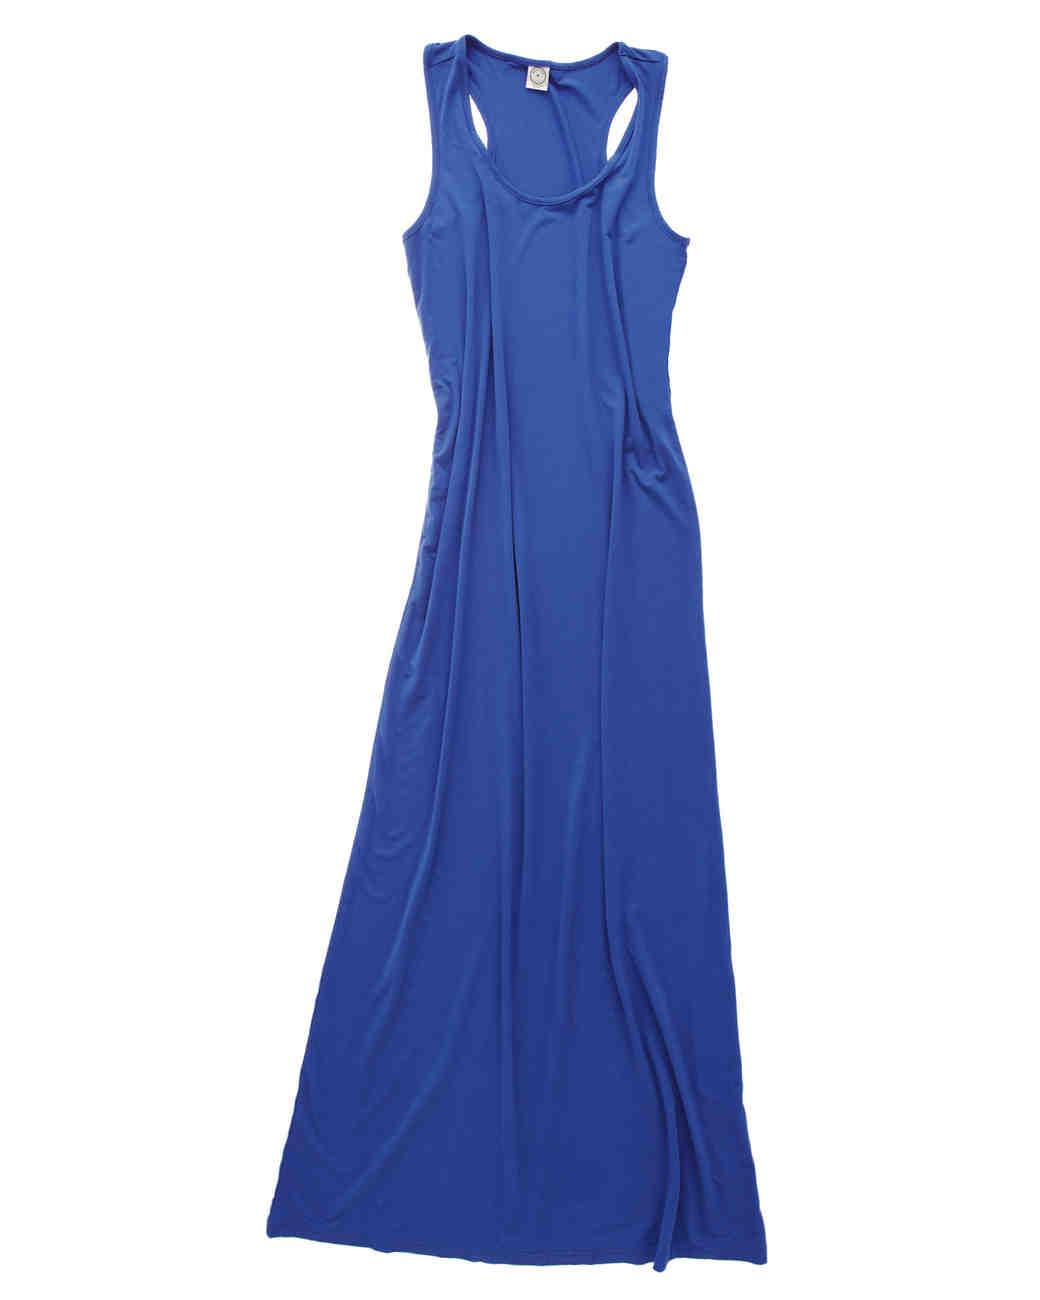 travel-accessories-blue-dress-mbd107658.jpg